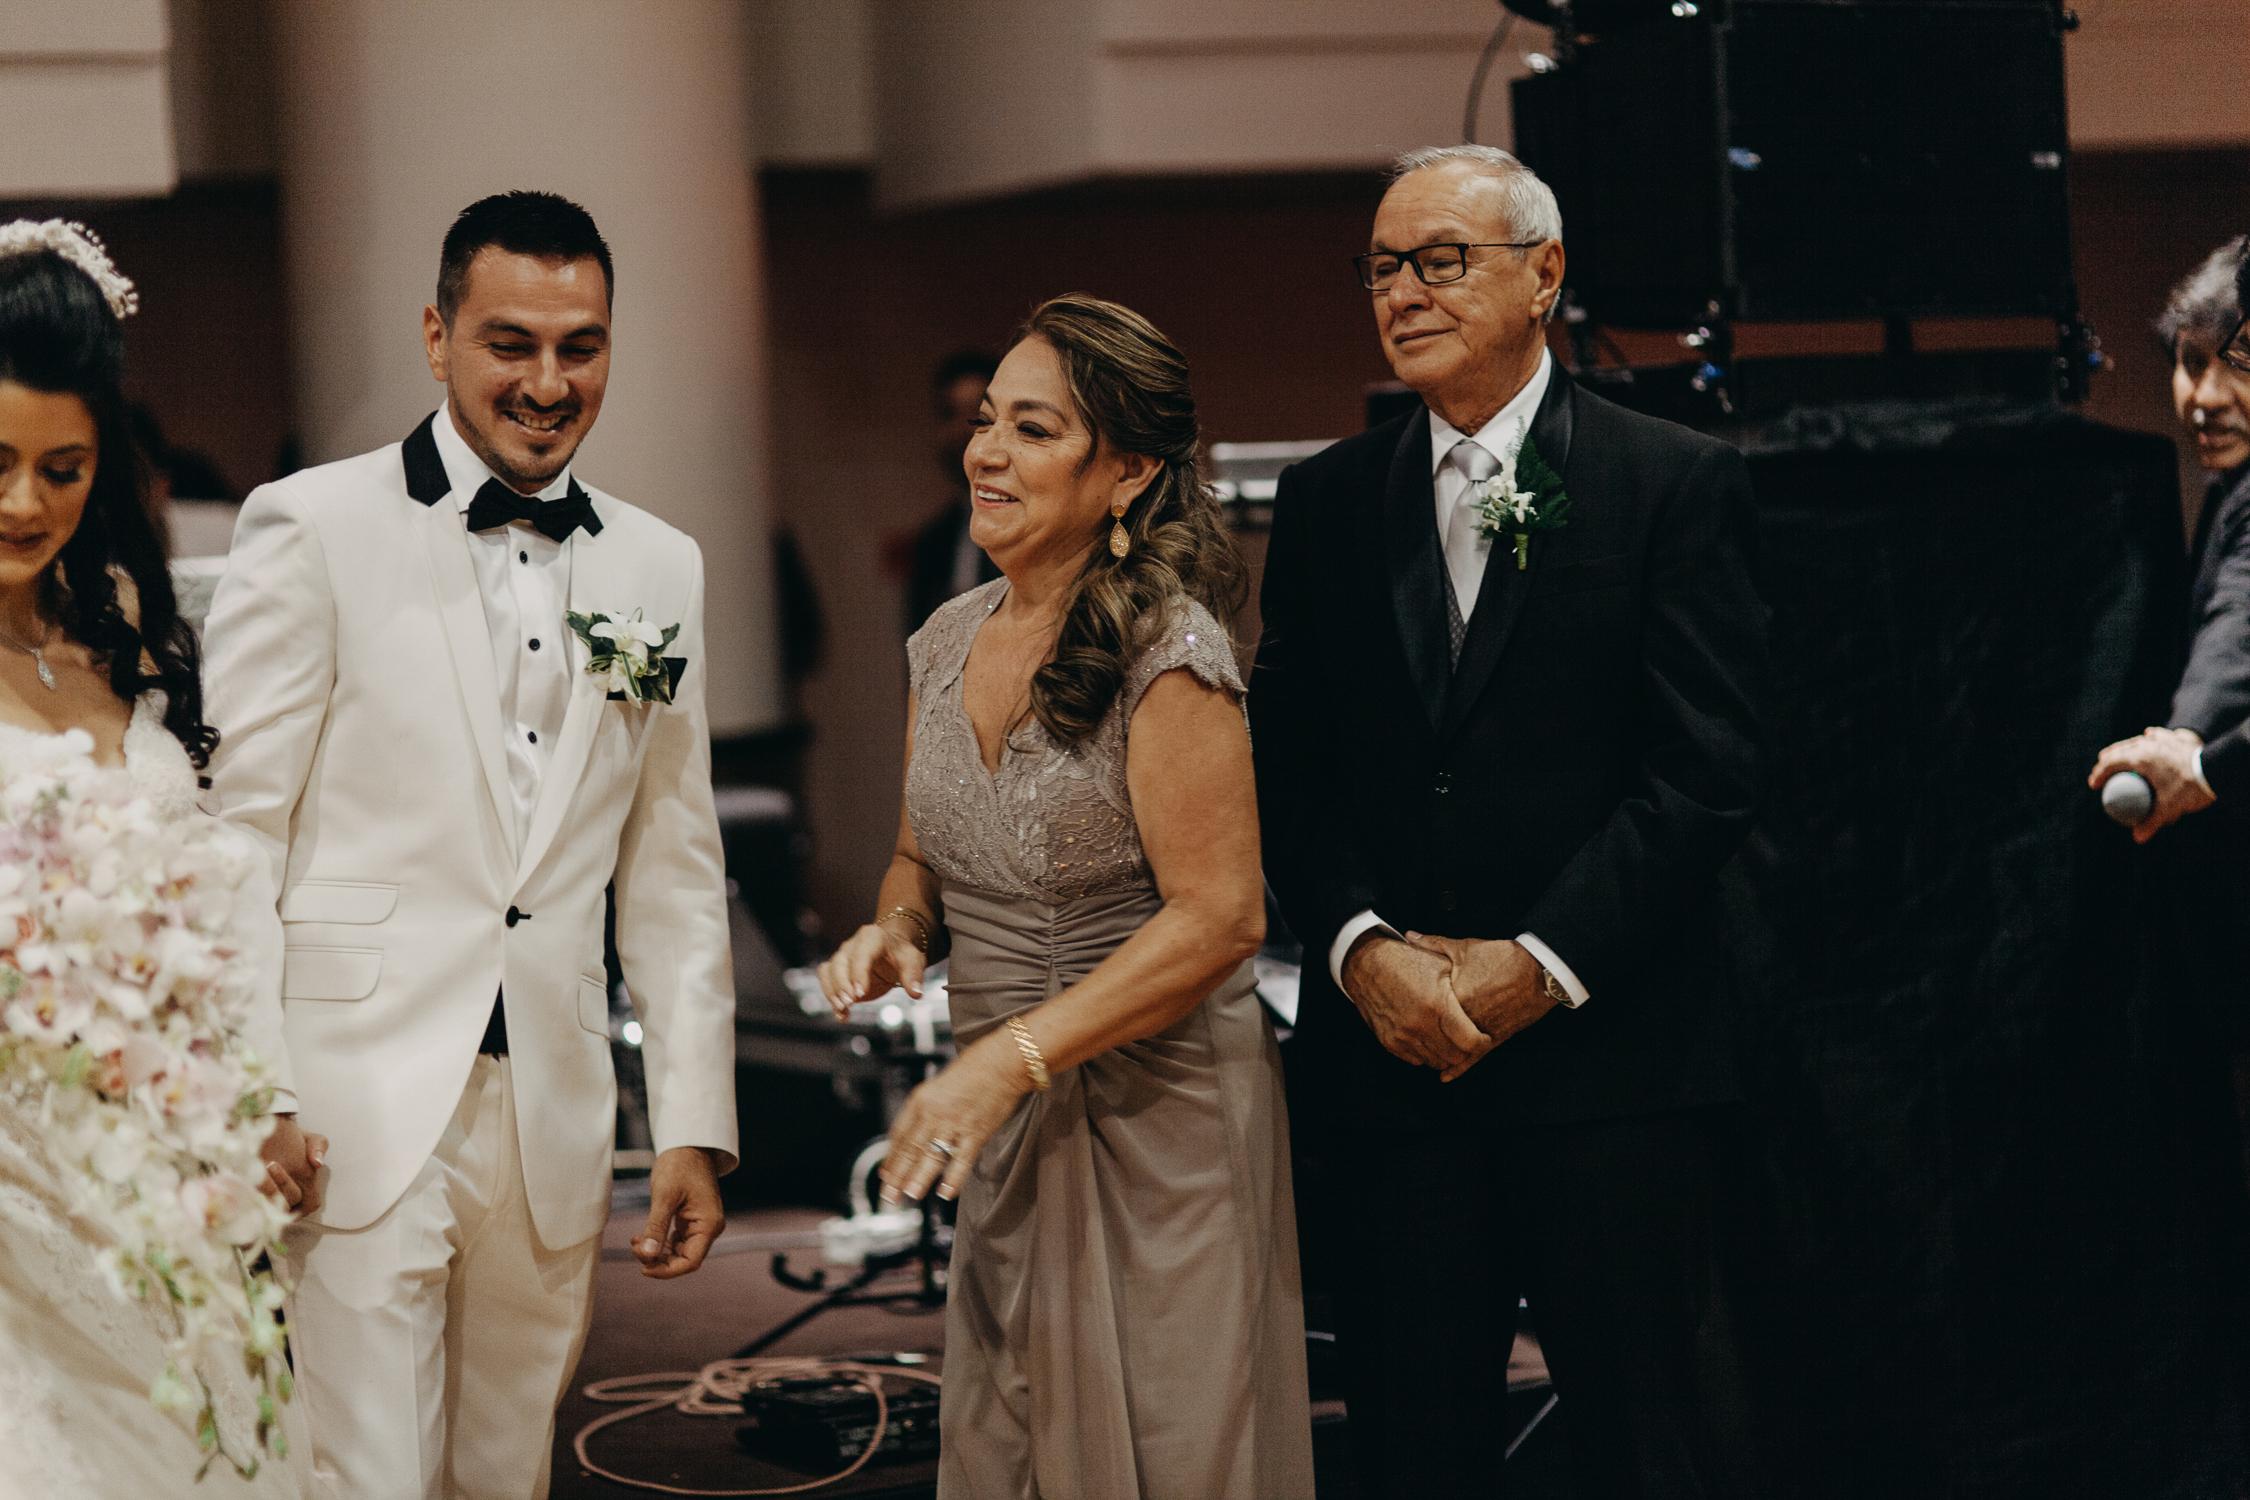 Michelle-Agurto-Fotografia-Bodas-Ecuador-Destination-Wedding-Photographer-Daniela-Dirk-43.JPG